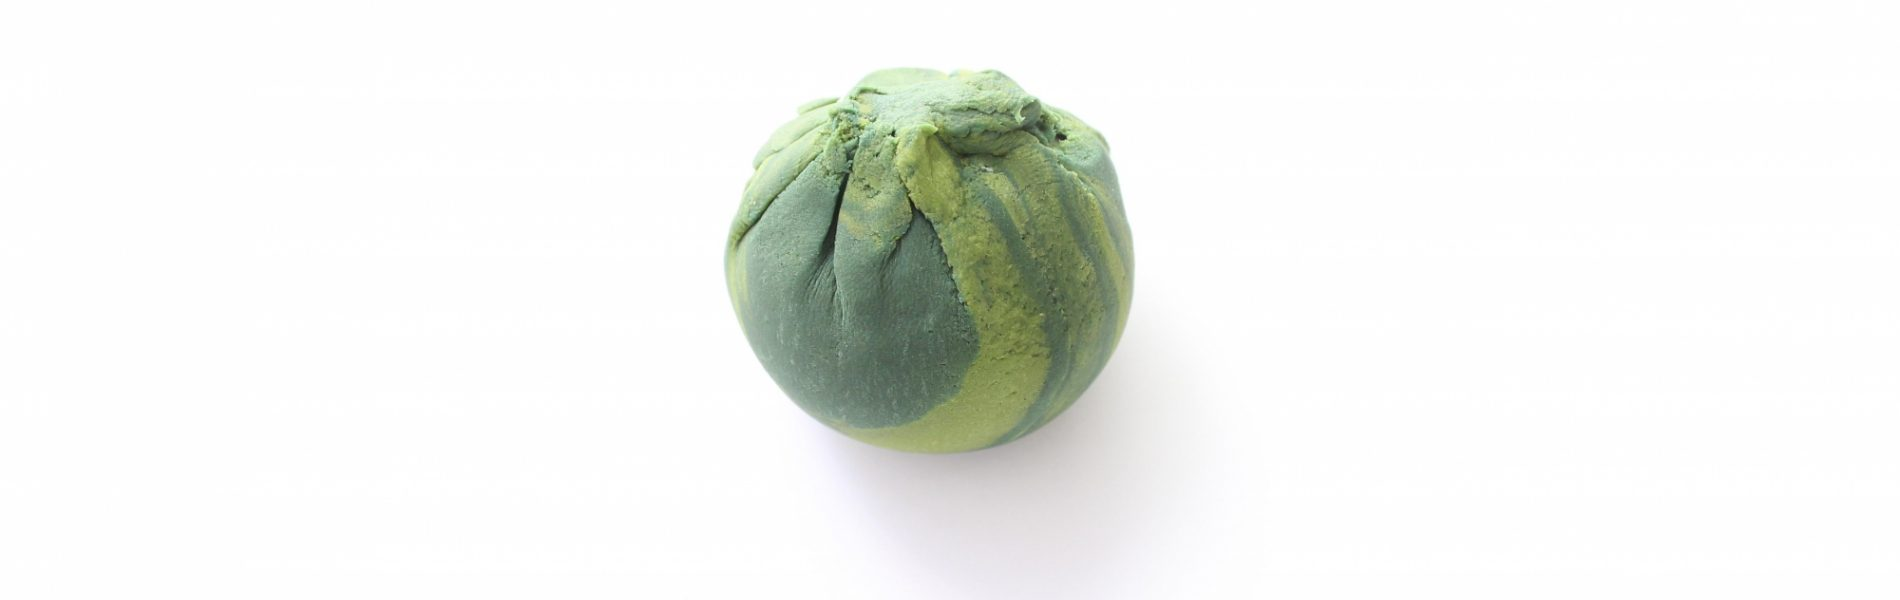 watermelon-Slice_IIMG_0538.JPG?mtime=20200803110957#asset:344490:homeHero